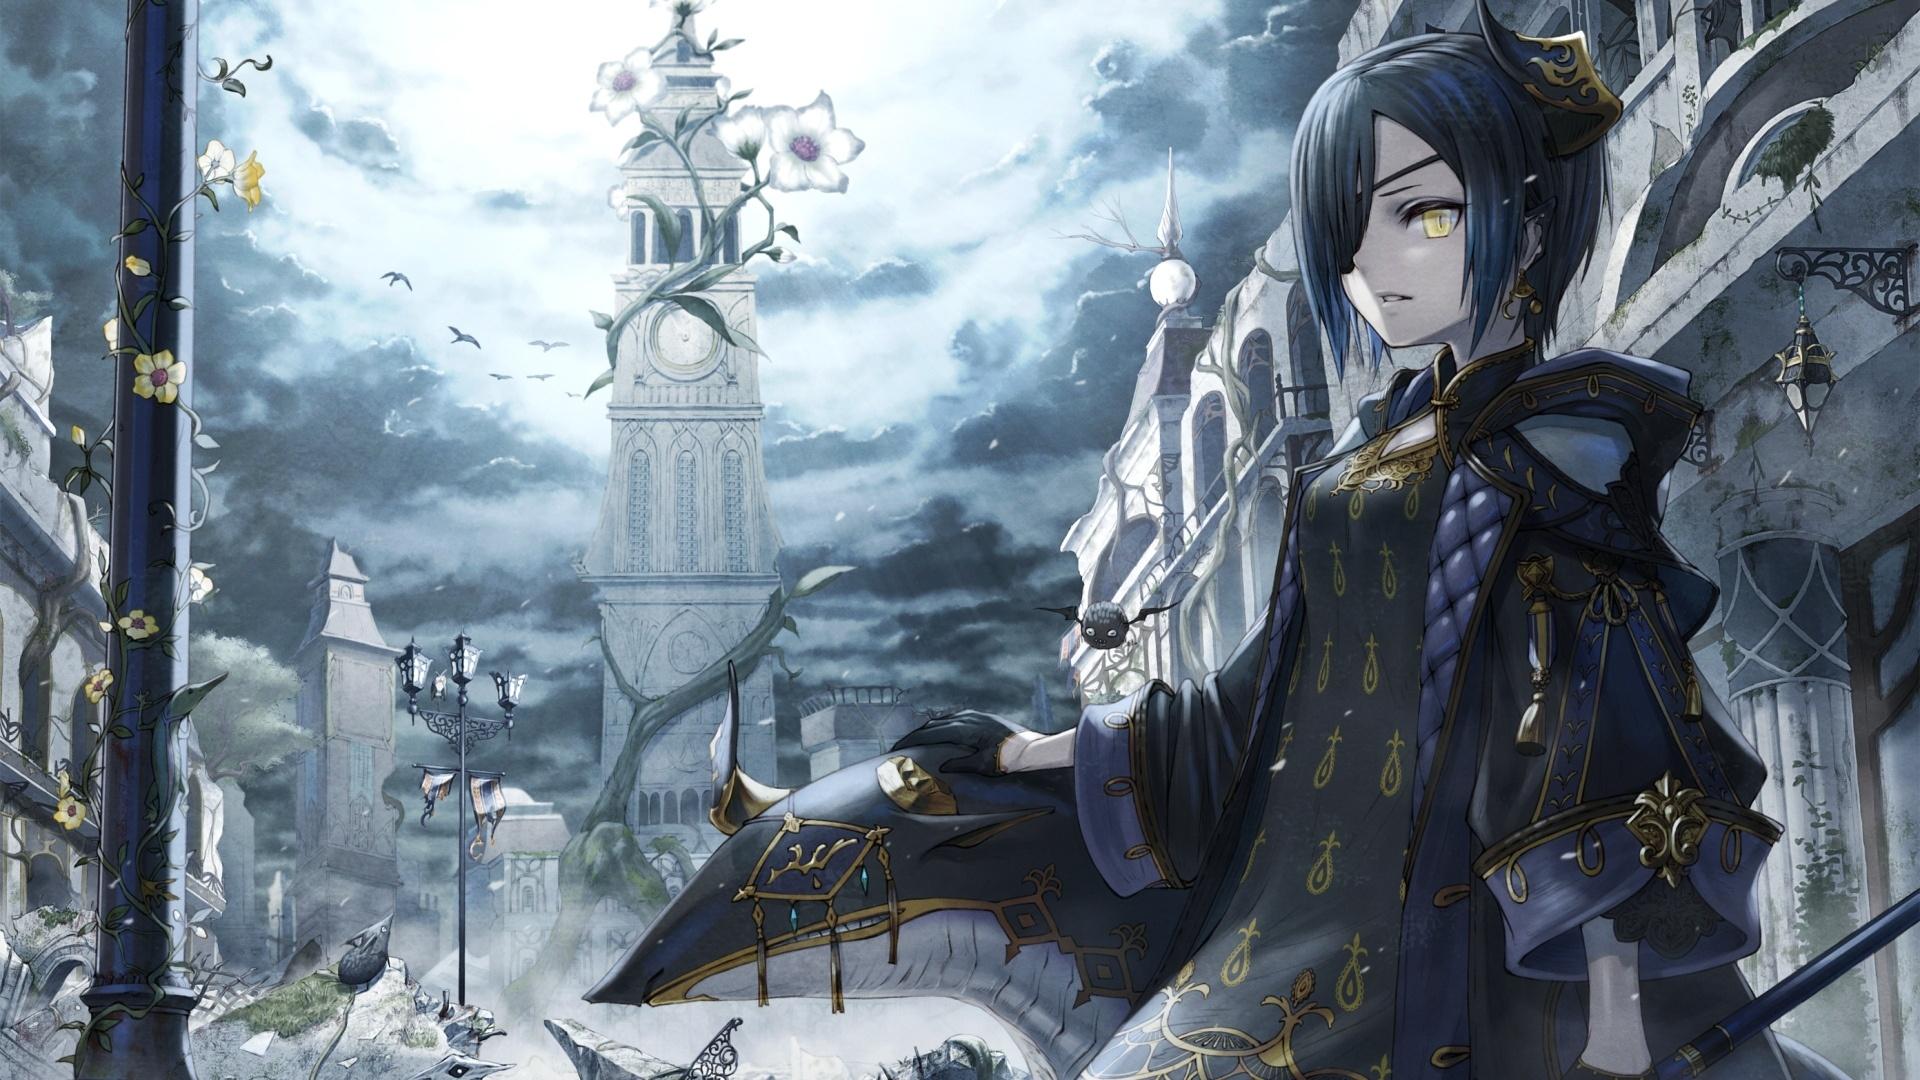 Anime Gothic Girl computer wallpaper